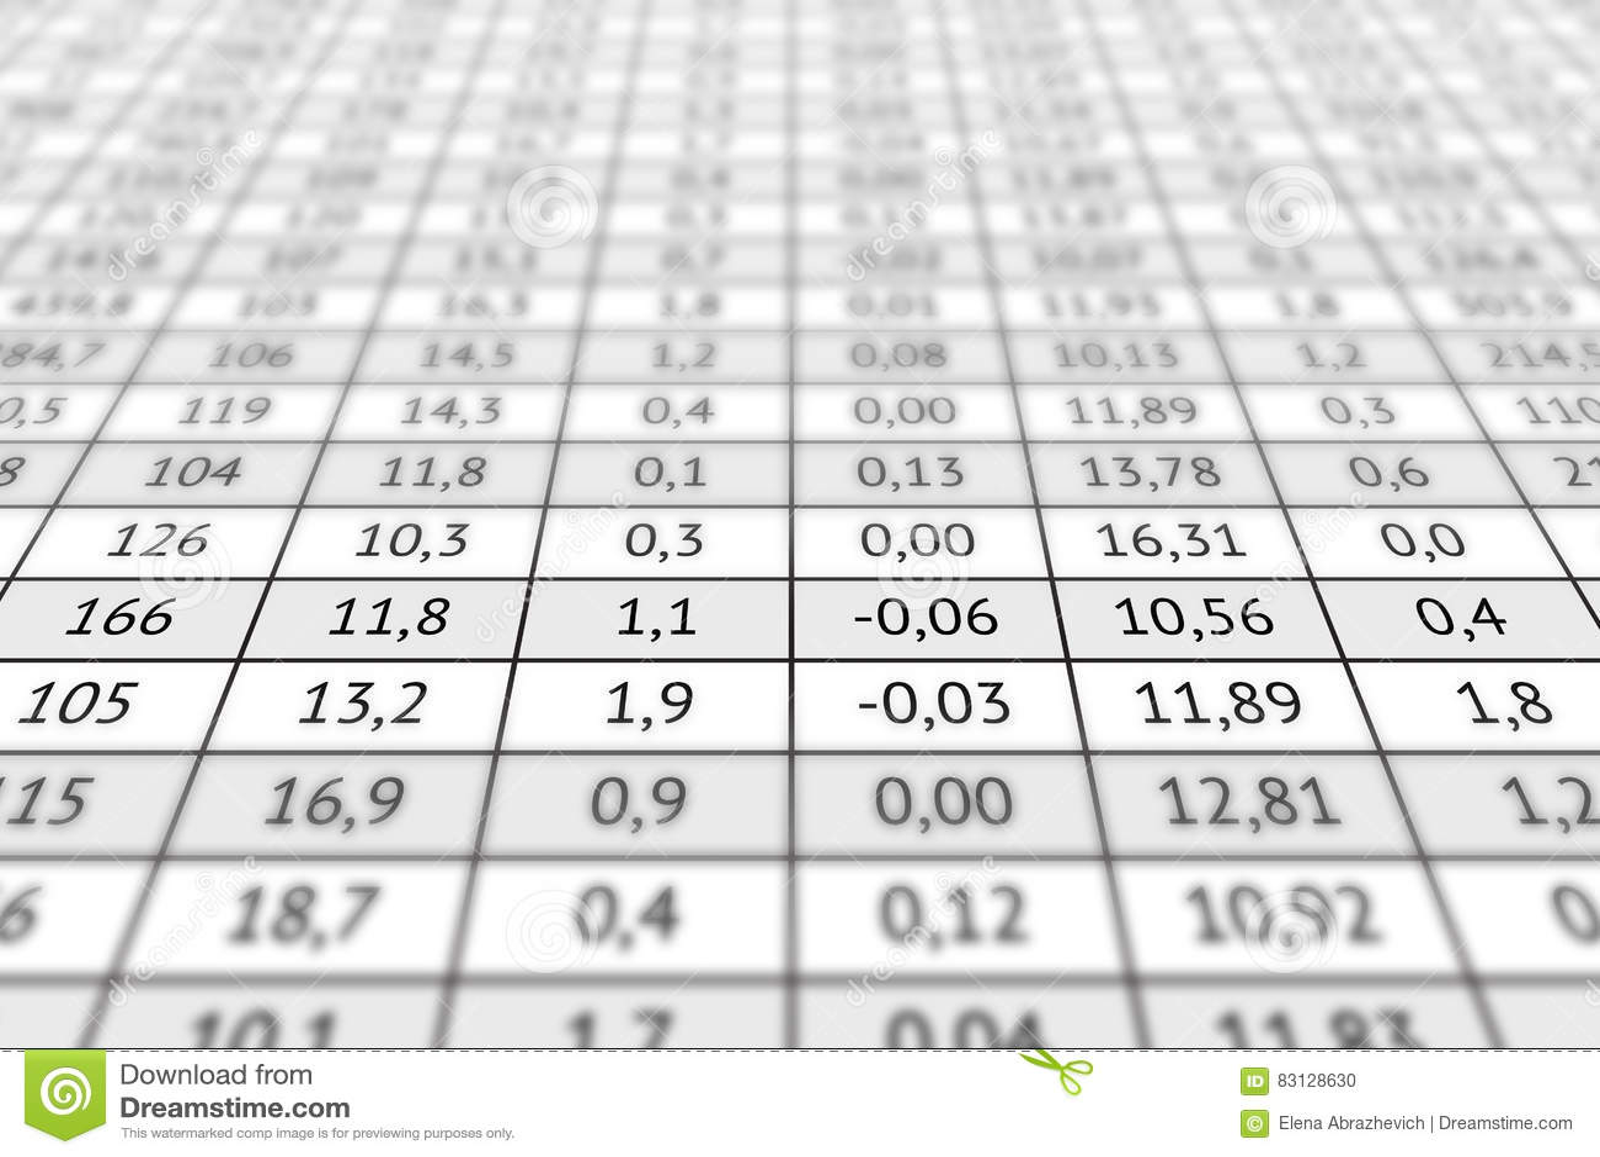 Wondrous Table With Numerical Data Stock Photo Image Of Economics Download Free Architecture Designs Scobabritishbridgeorg